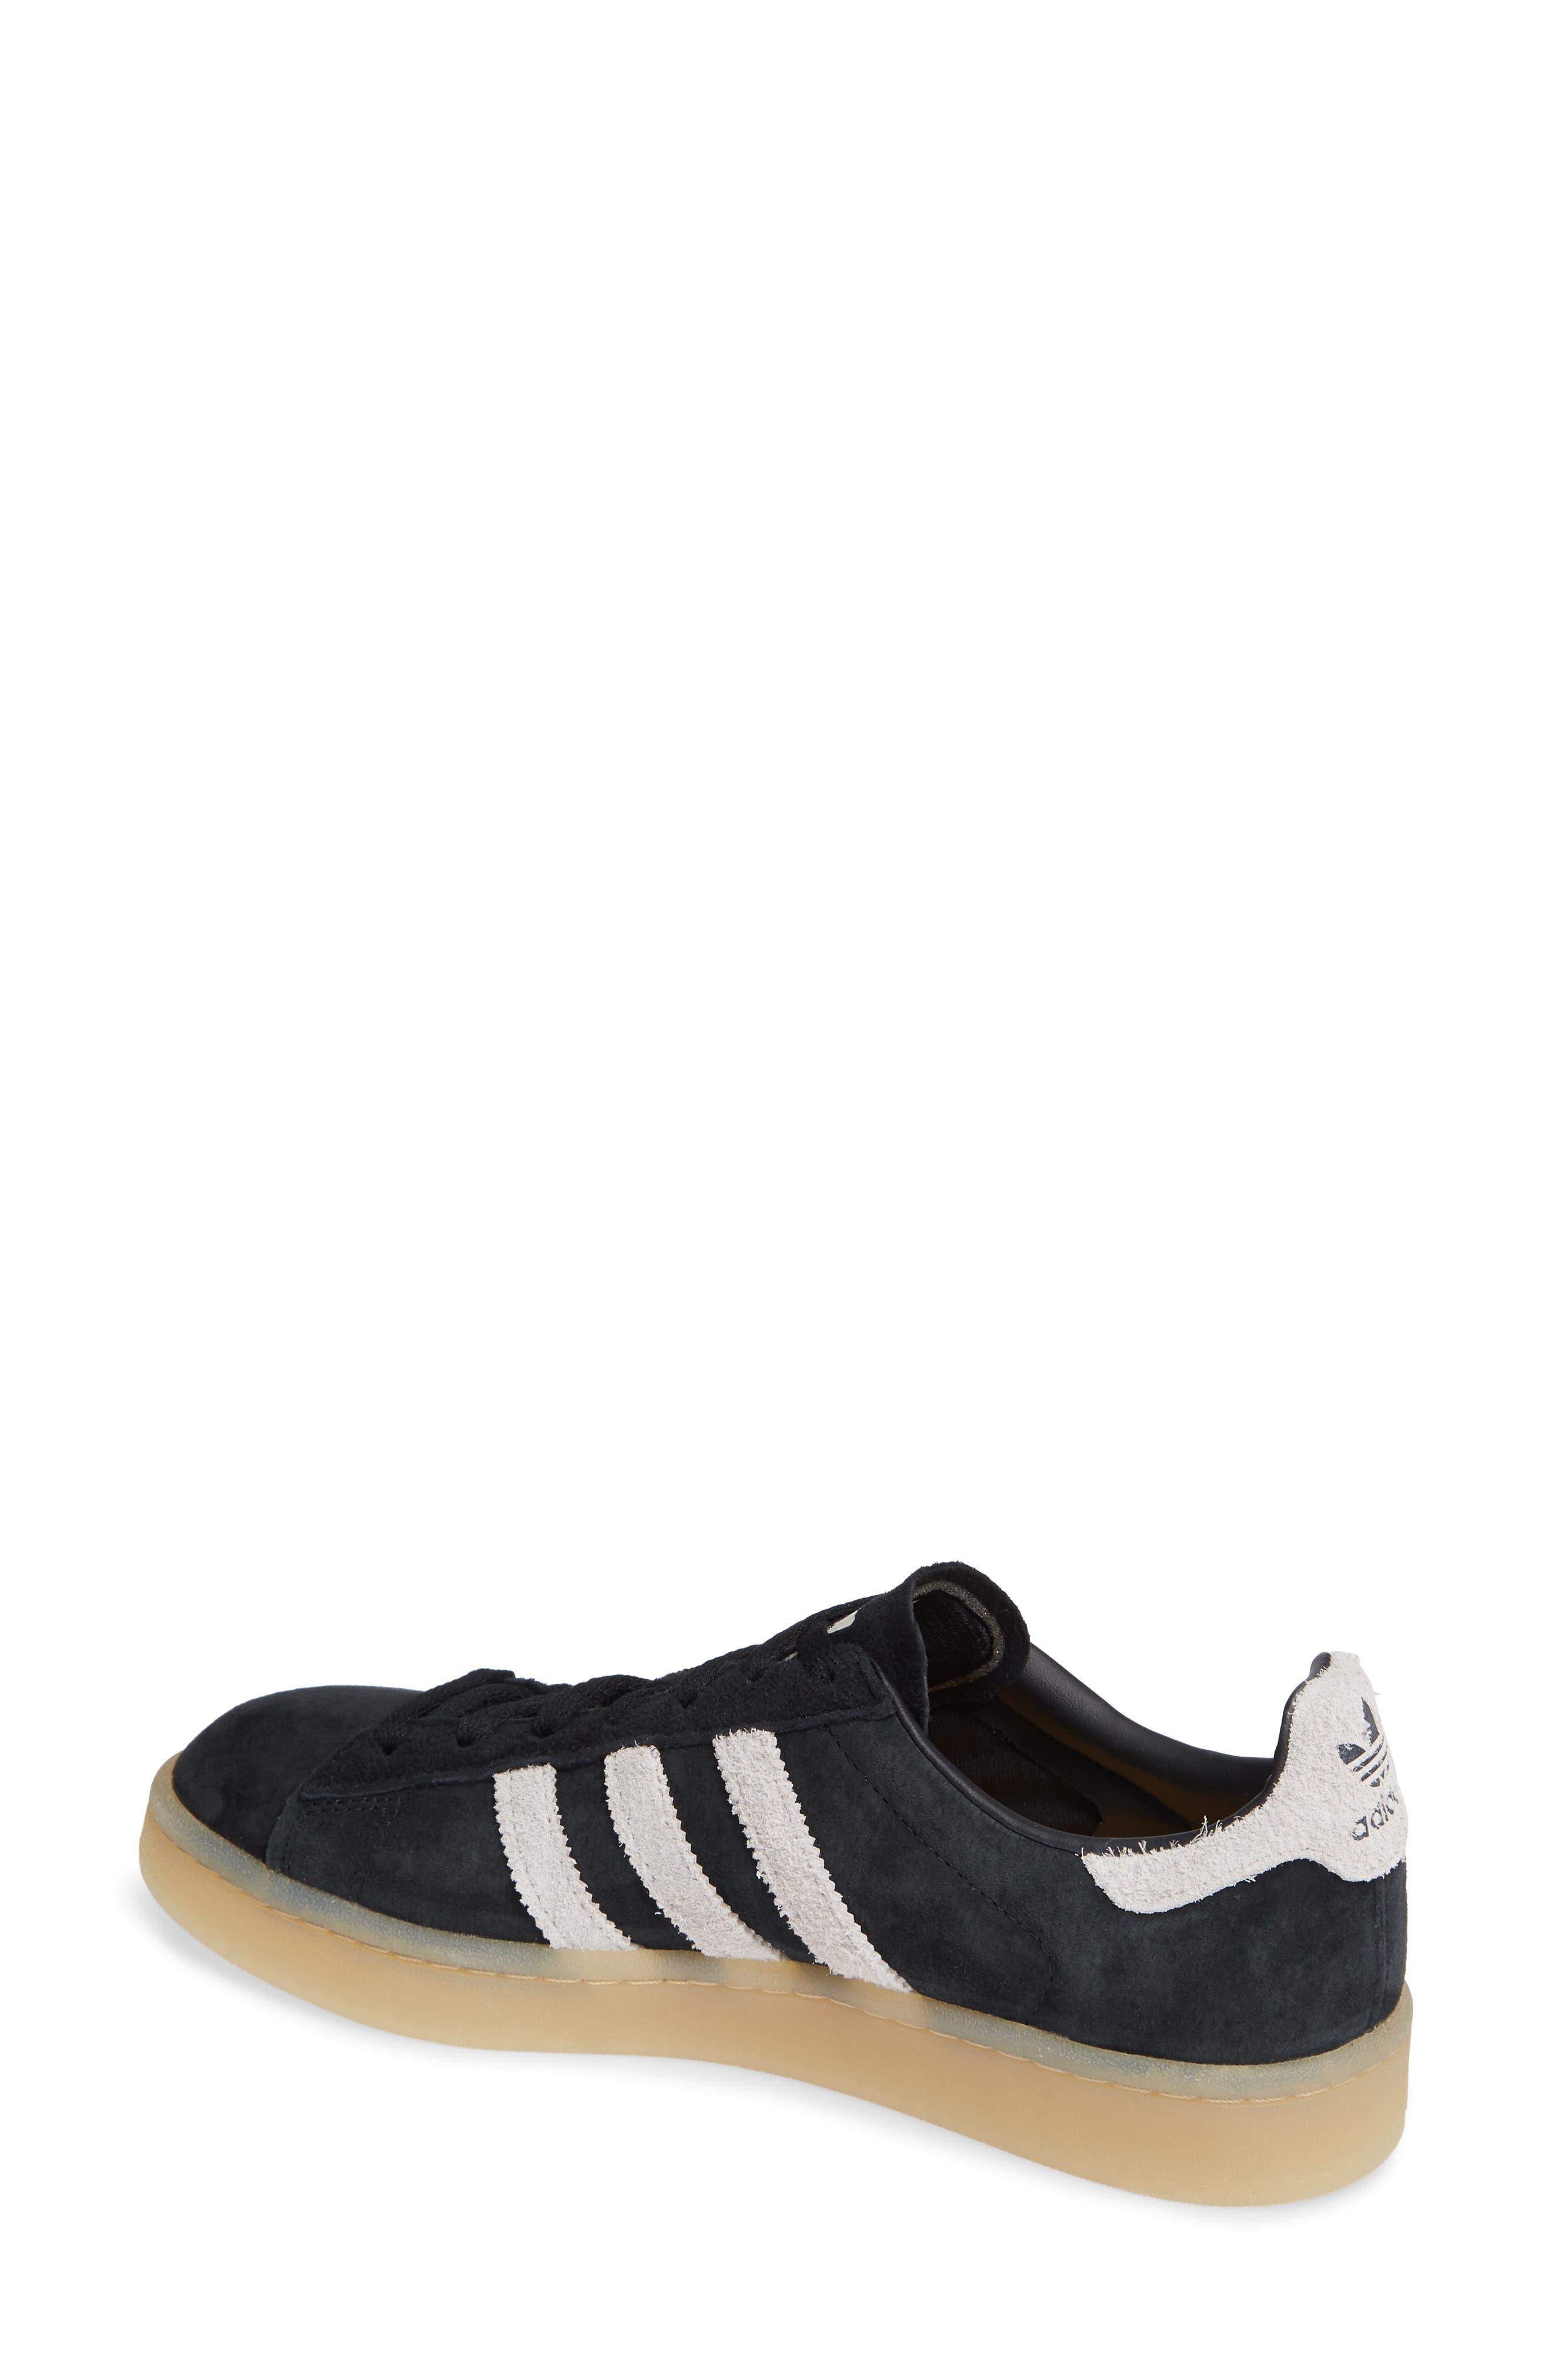 'Campus' Sneaker,                             Alternate thumbnail 2, color,                             003